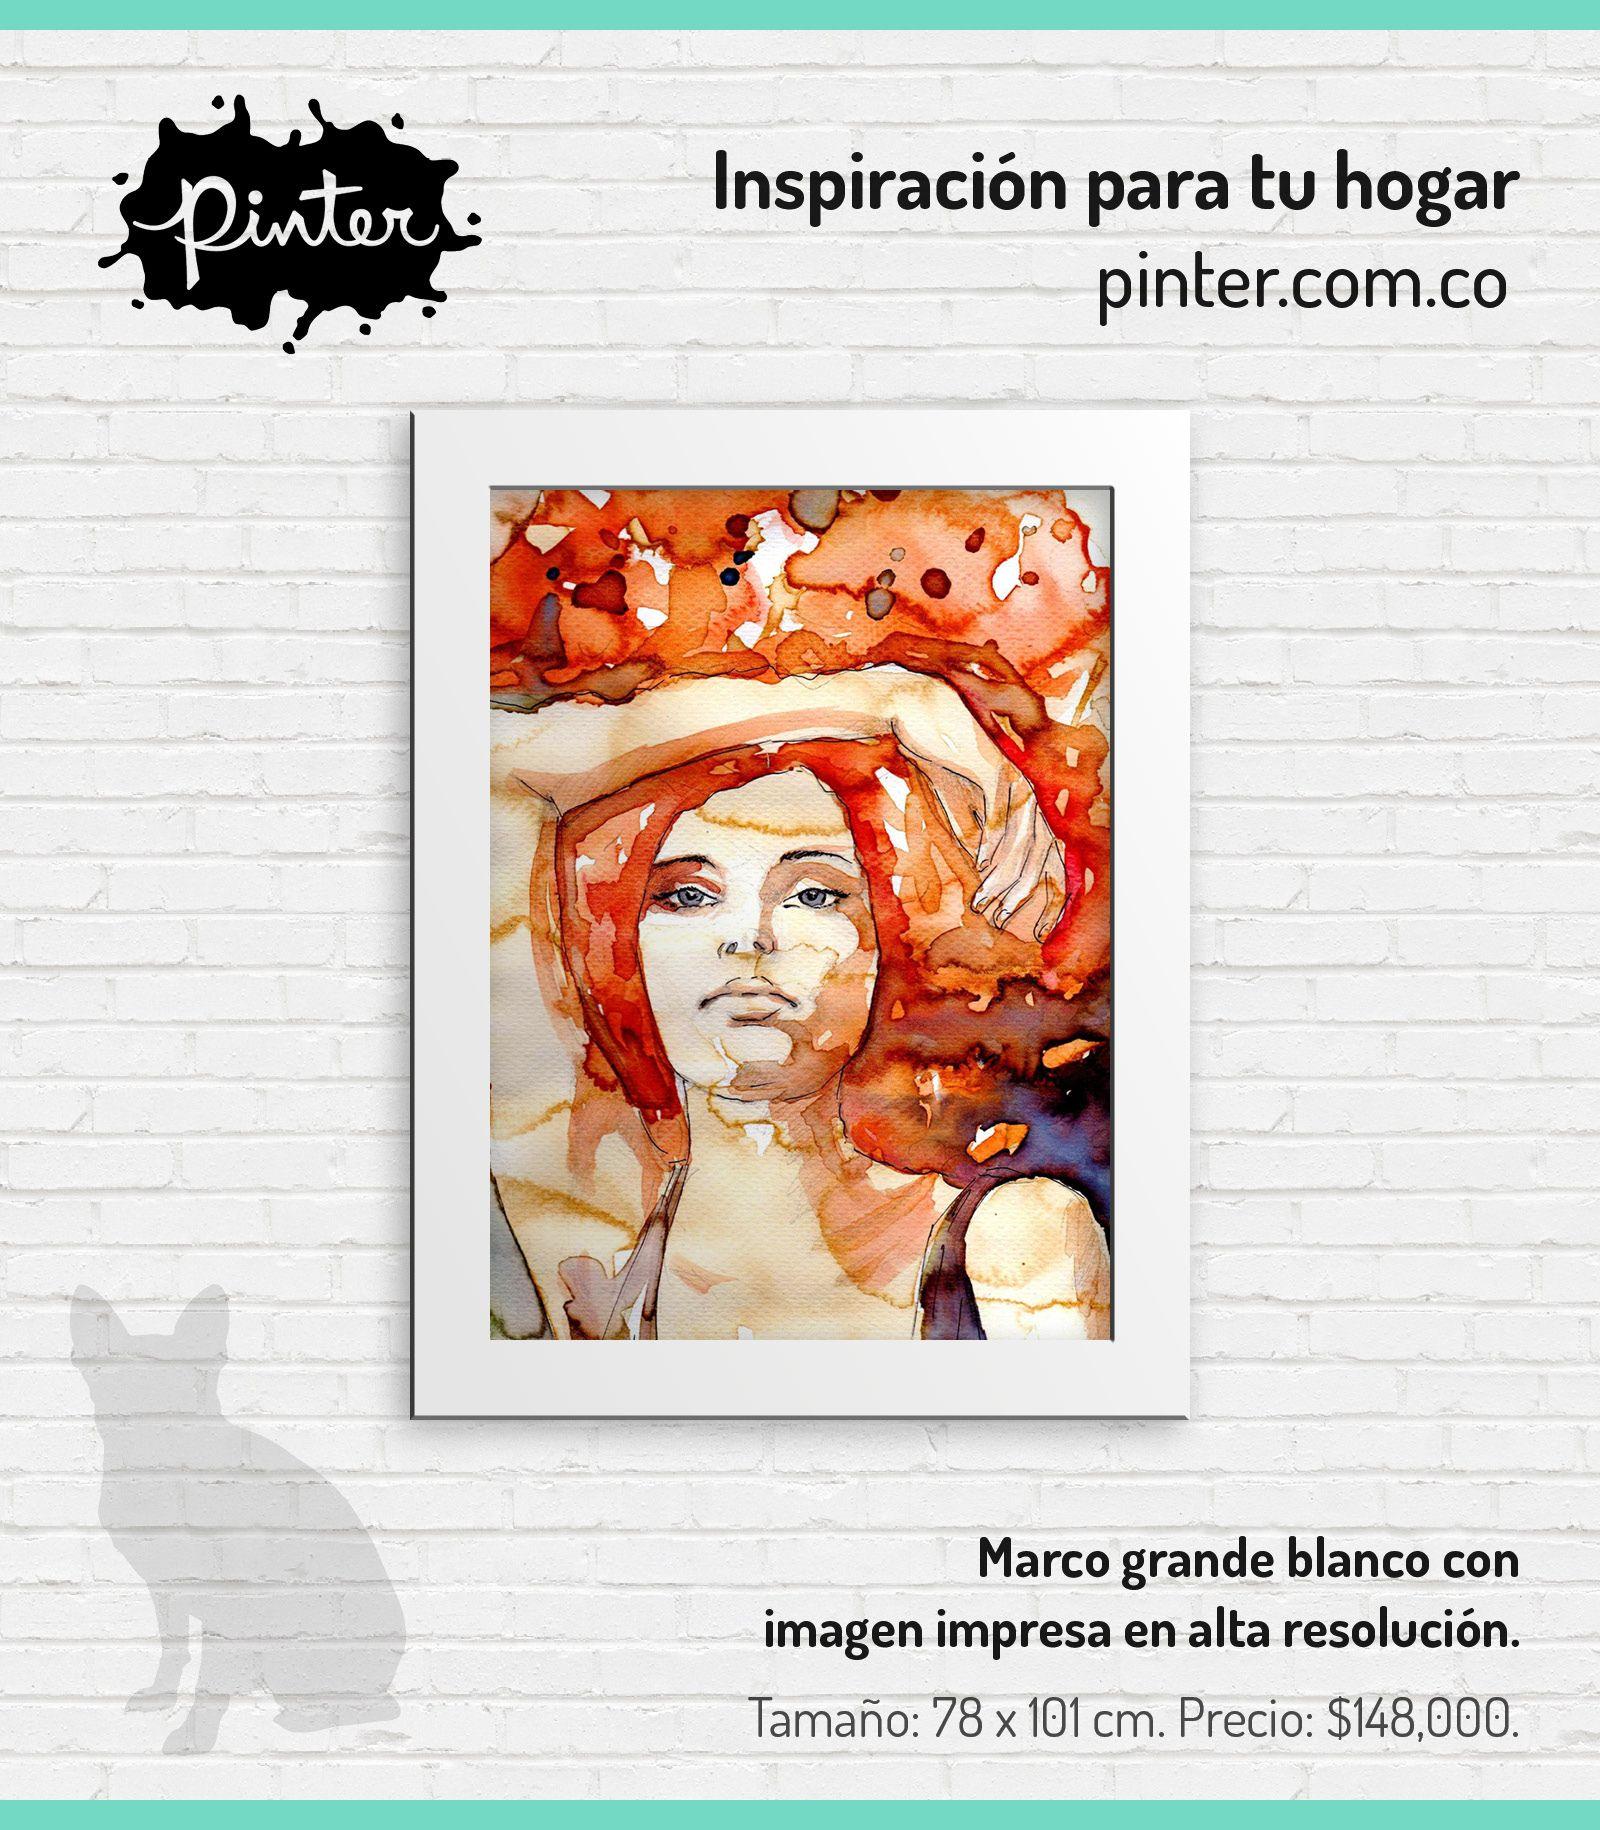 https://www.pinter.com.co/producto/mujer-hermosa-con-rizos-bruniewska/